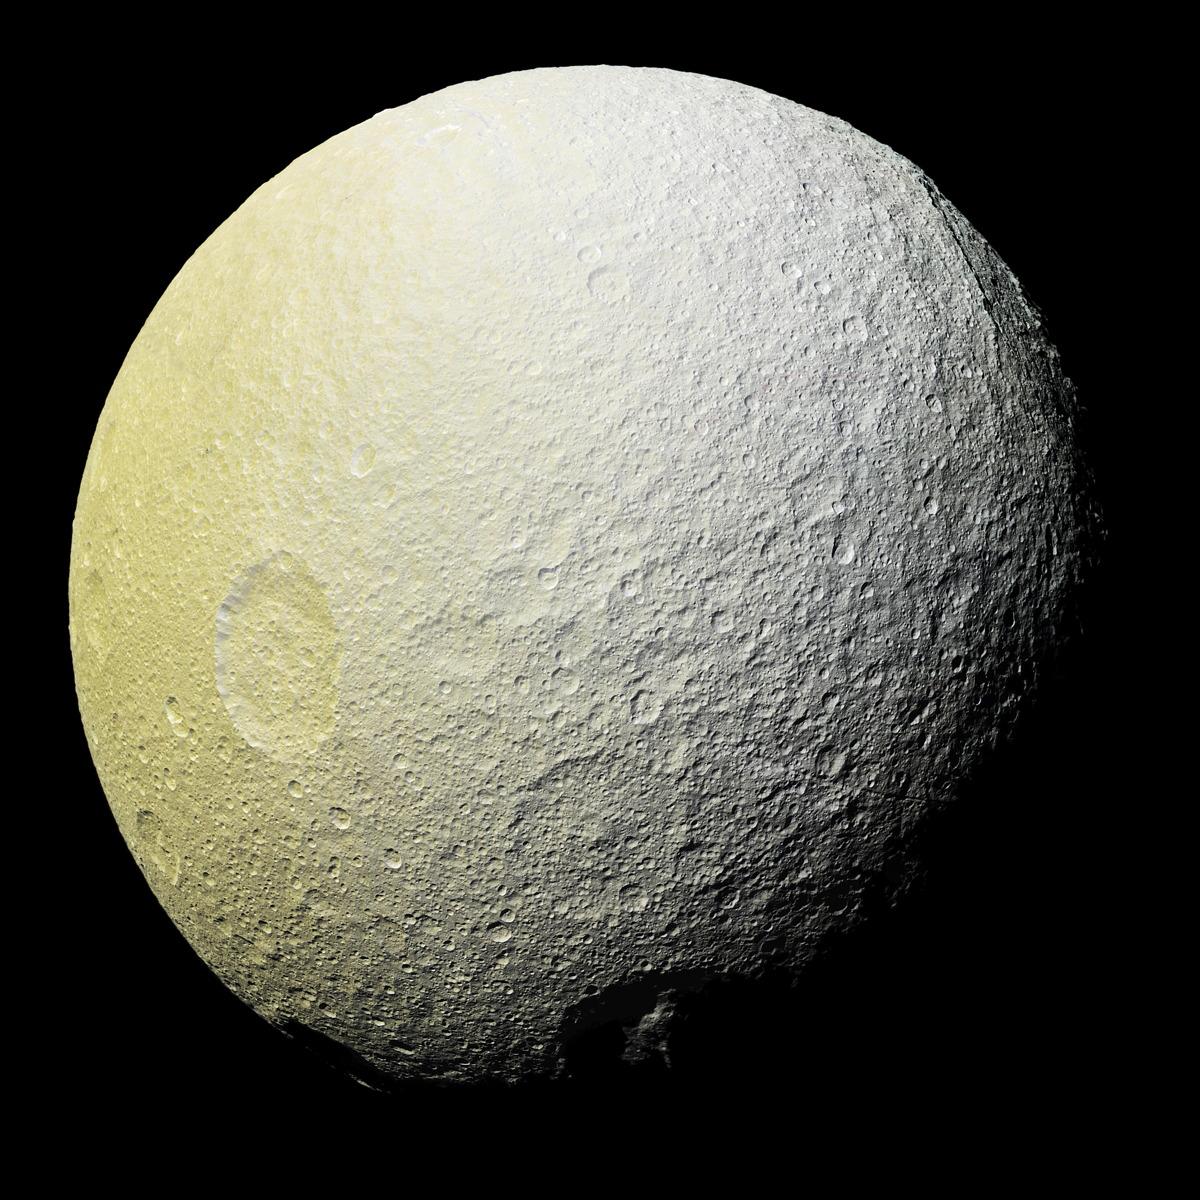 saturn-moon-tethys.jpg?1438703638